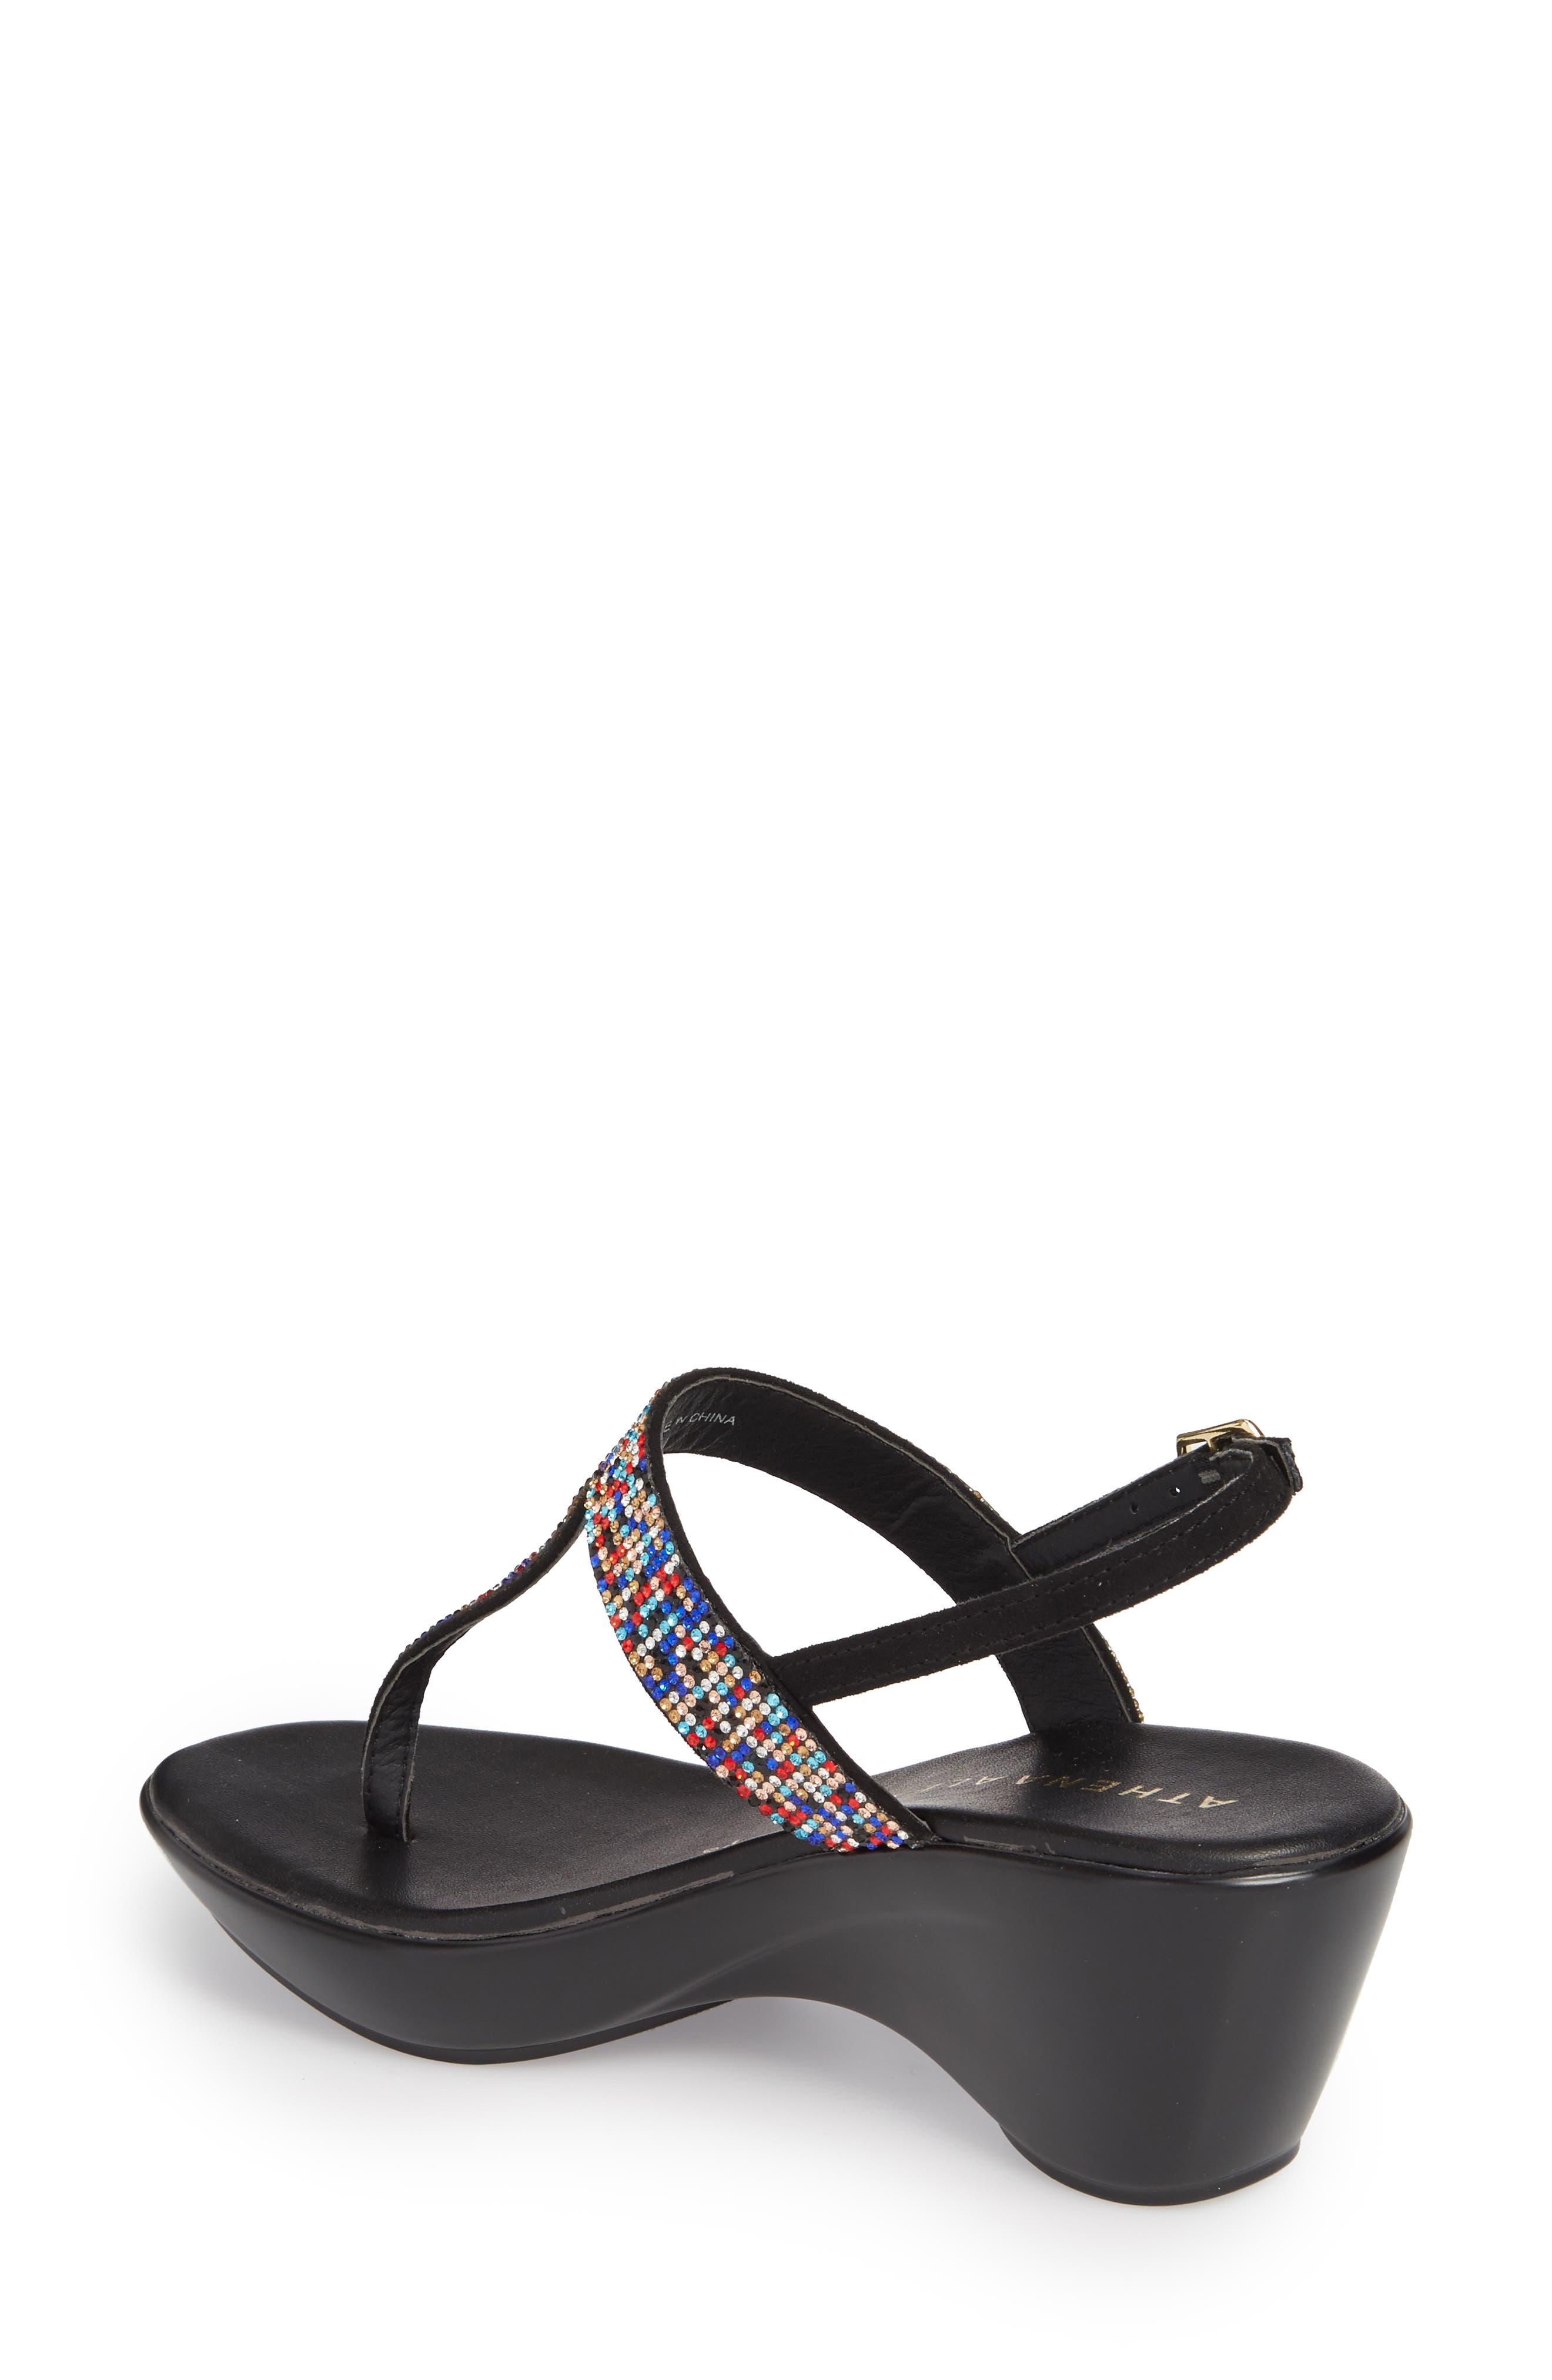 Dakkota Wedge Sandal,                             Alternate thumbnail 2, color,                             001